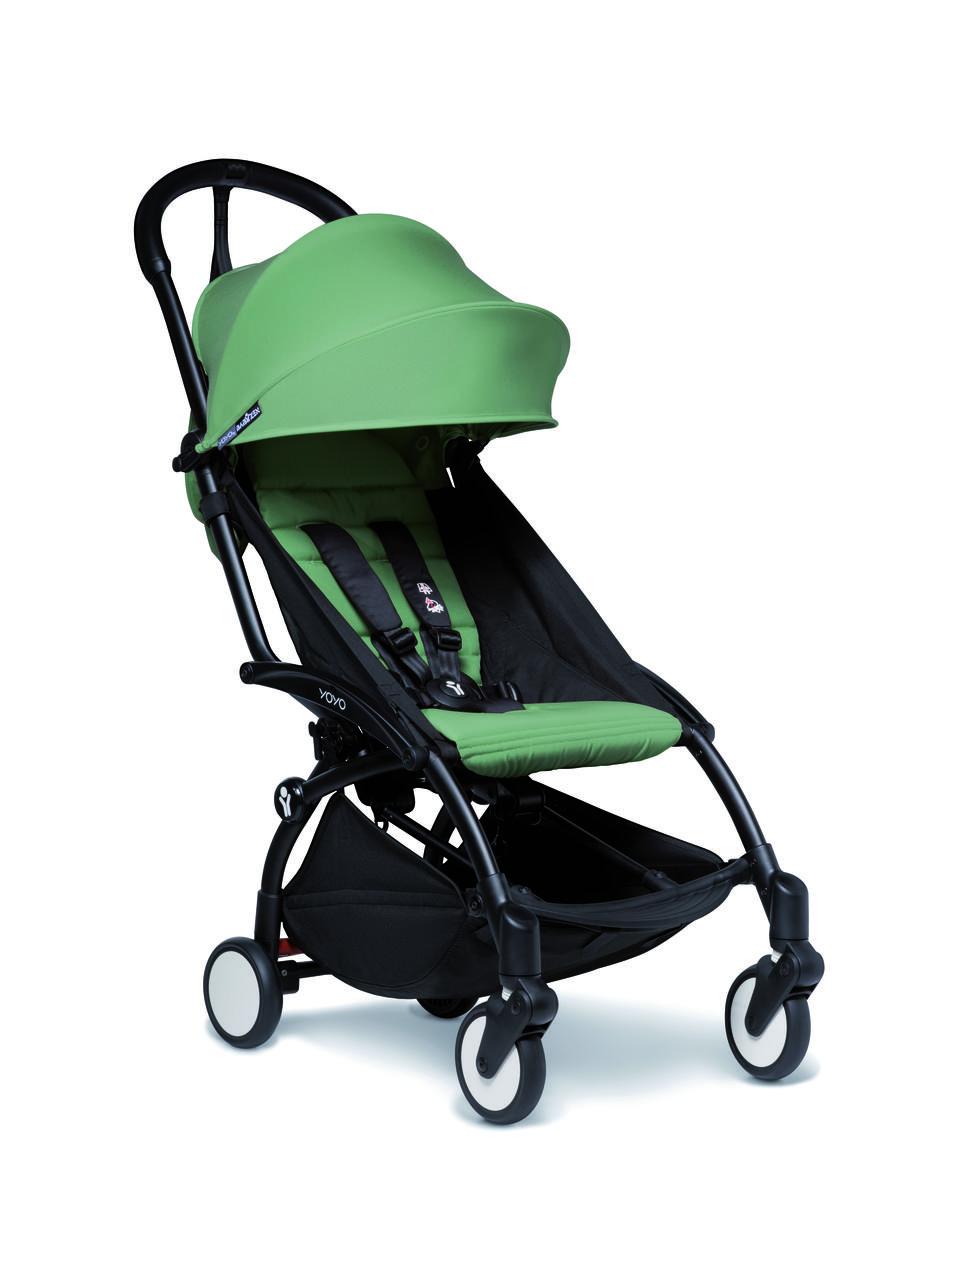 Прогулочная коляска BABYZEN YOYO² с 6 месяцев (шасси Black) Peppermint (BZ10109-02, BZ10104-08)